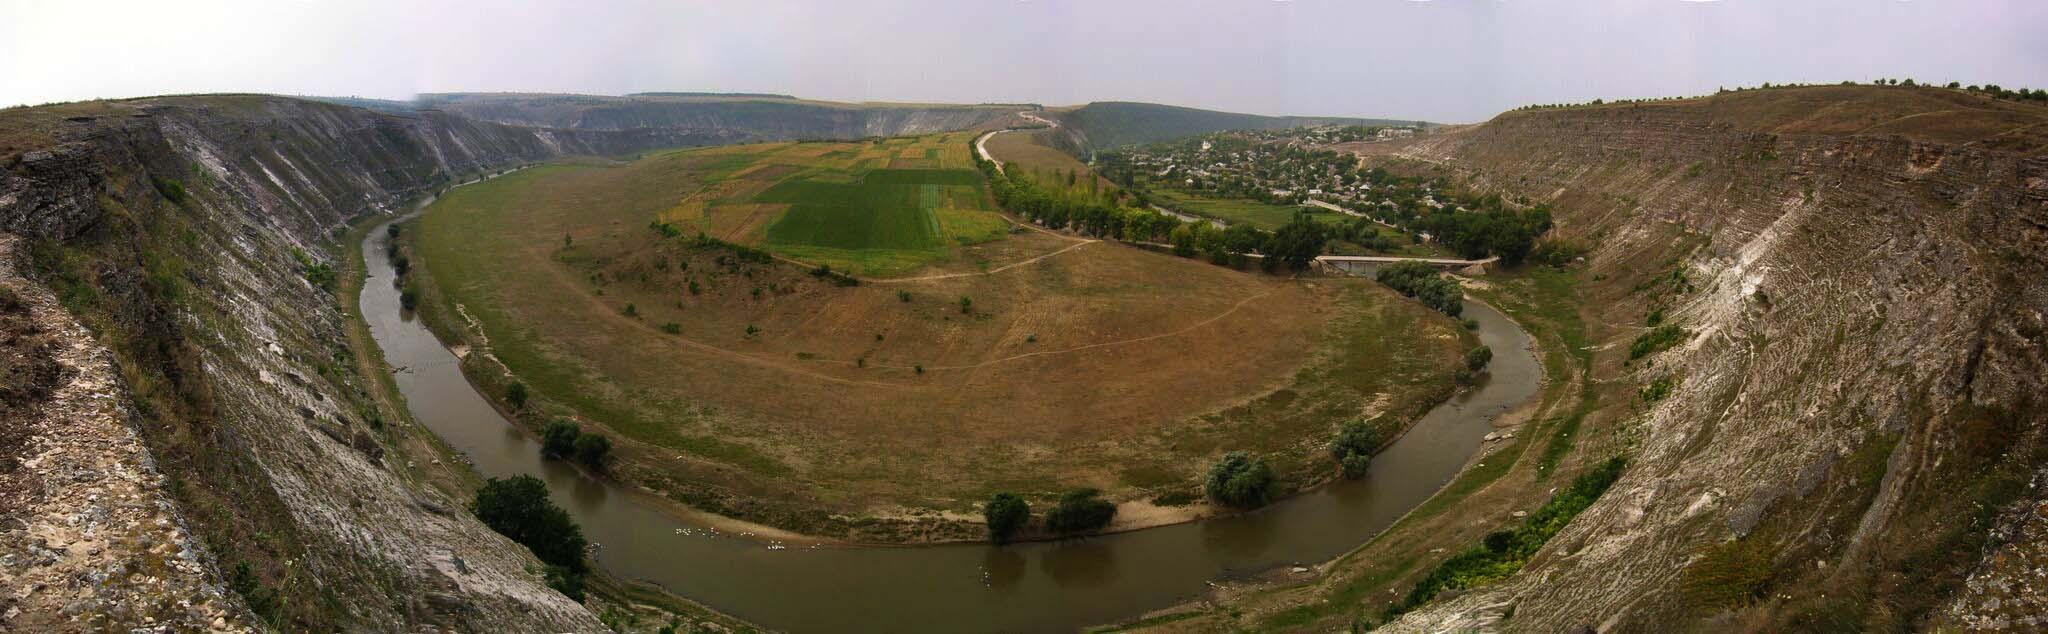 OV-Panorama-Est1-ps-background.jpg